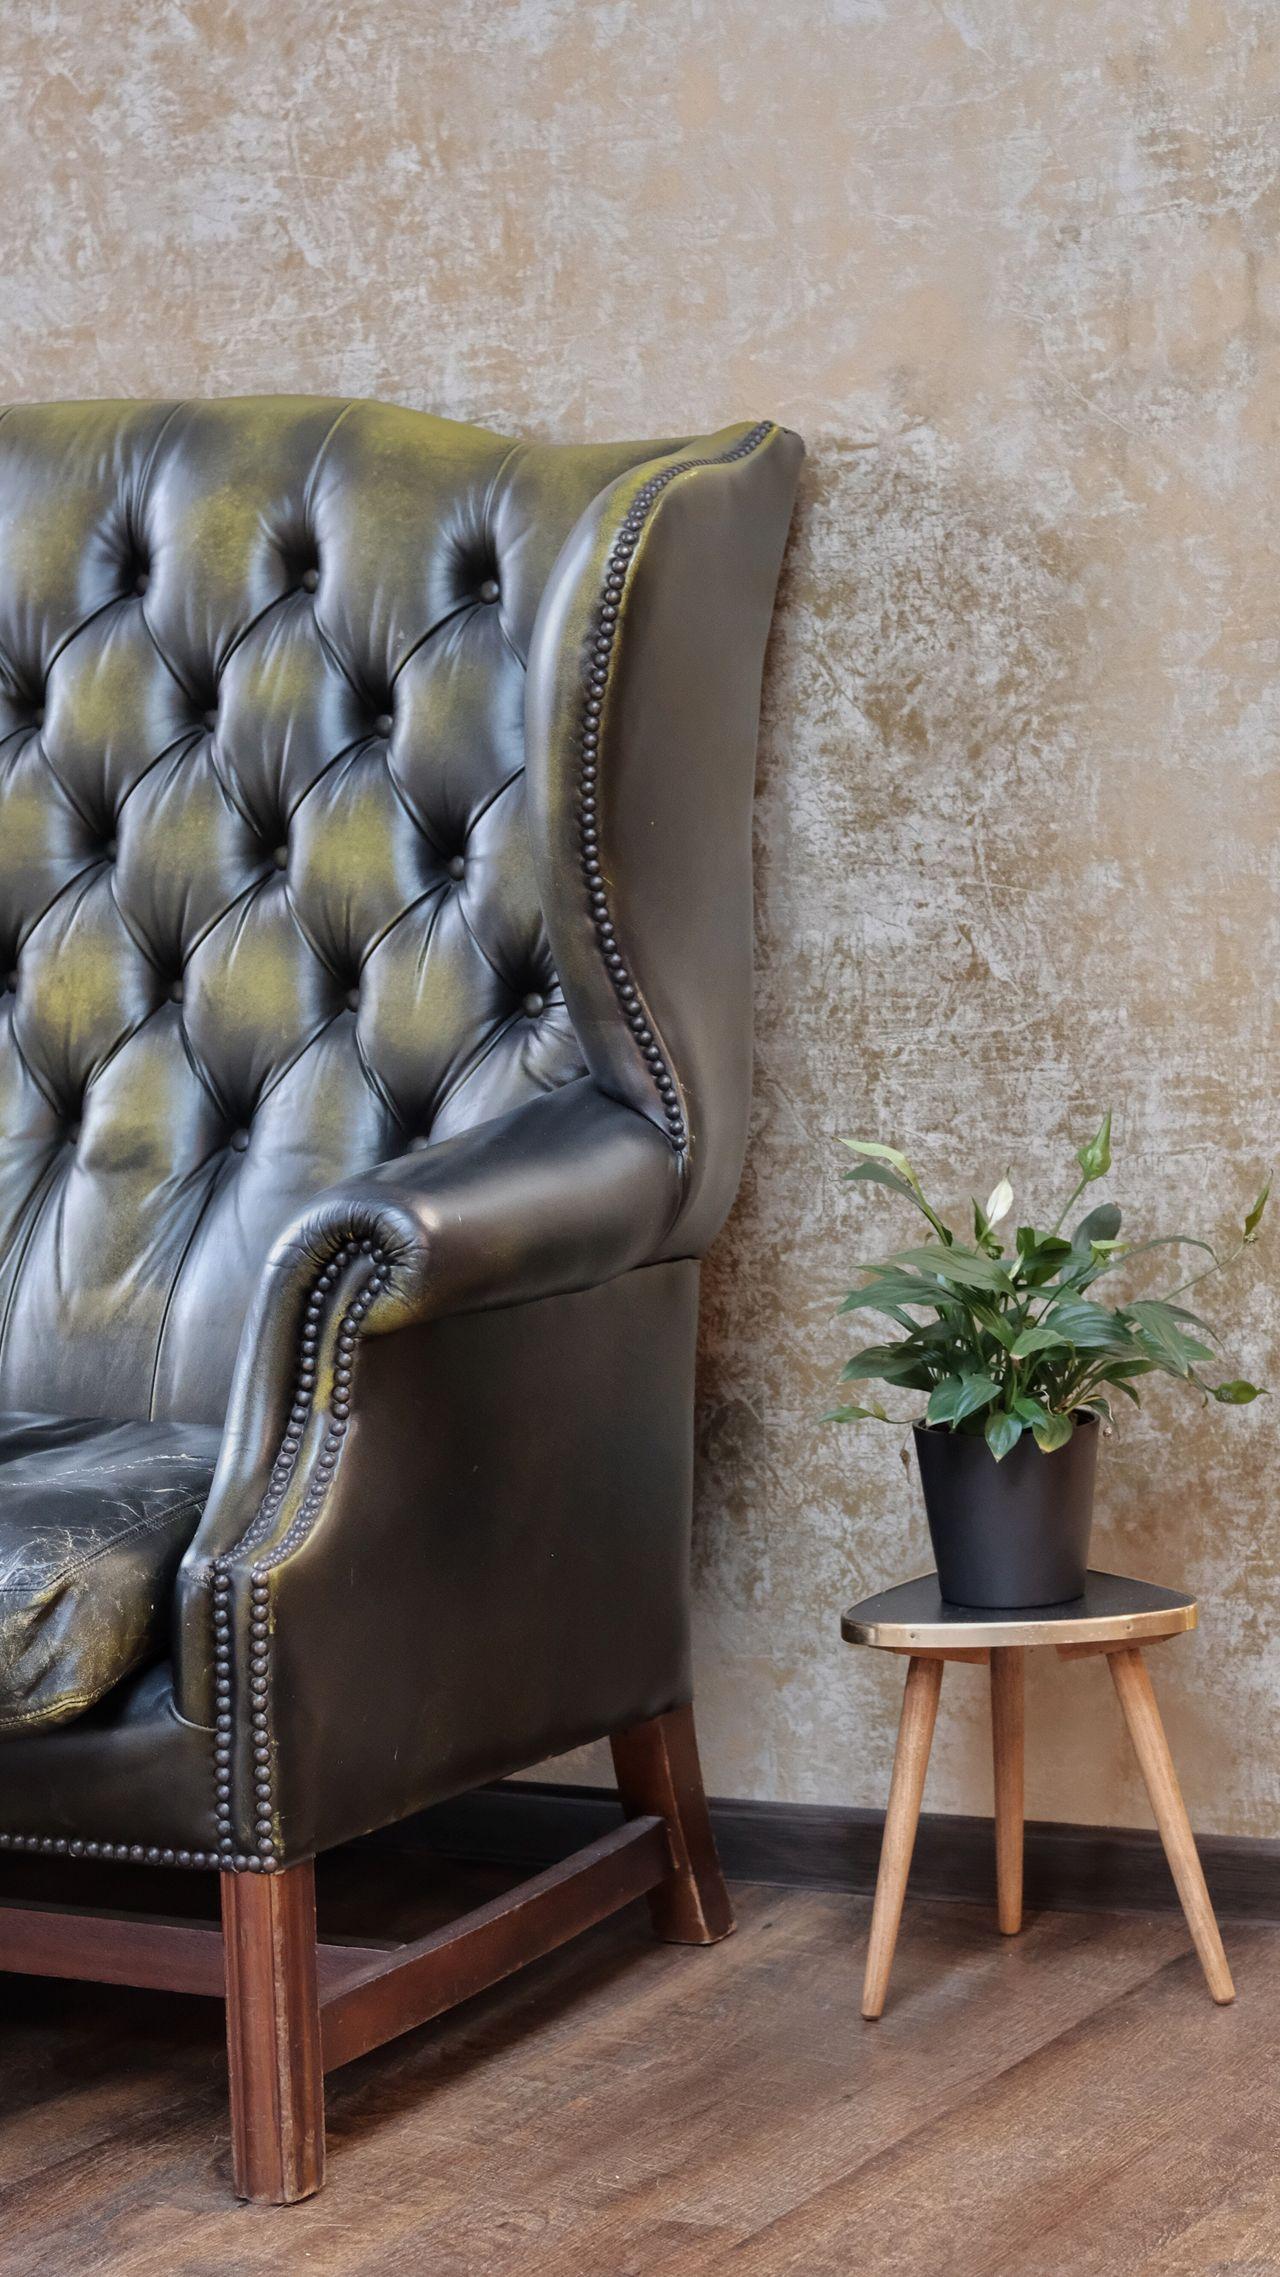 Chair Plant Indoors  Home Interior Armchair No People Living Room Side Table Home Showcase Interior Day FUJIFILM X-T2 Andrea Lück Fujifilm Fujifilm_xseries